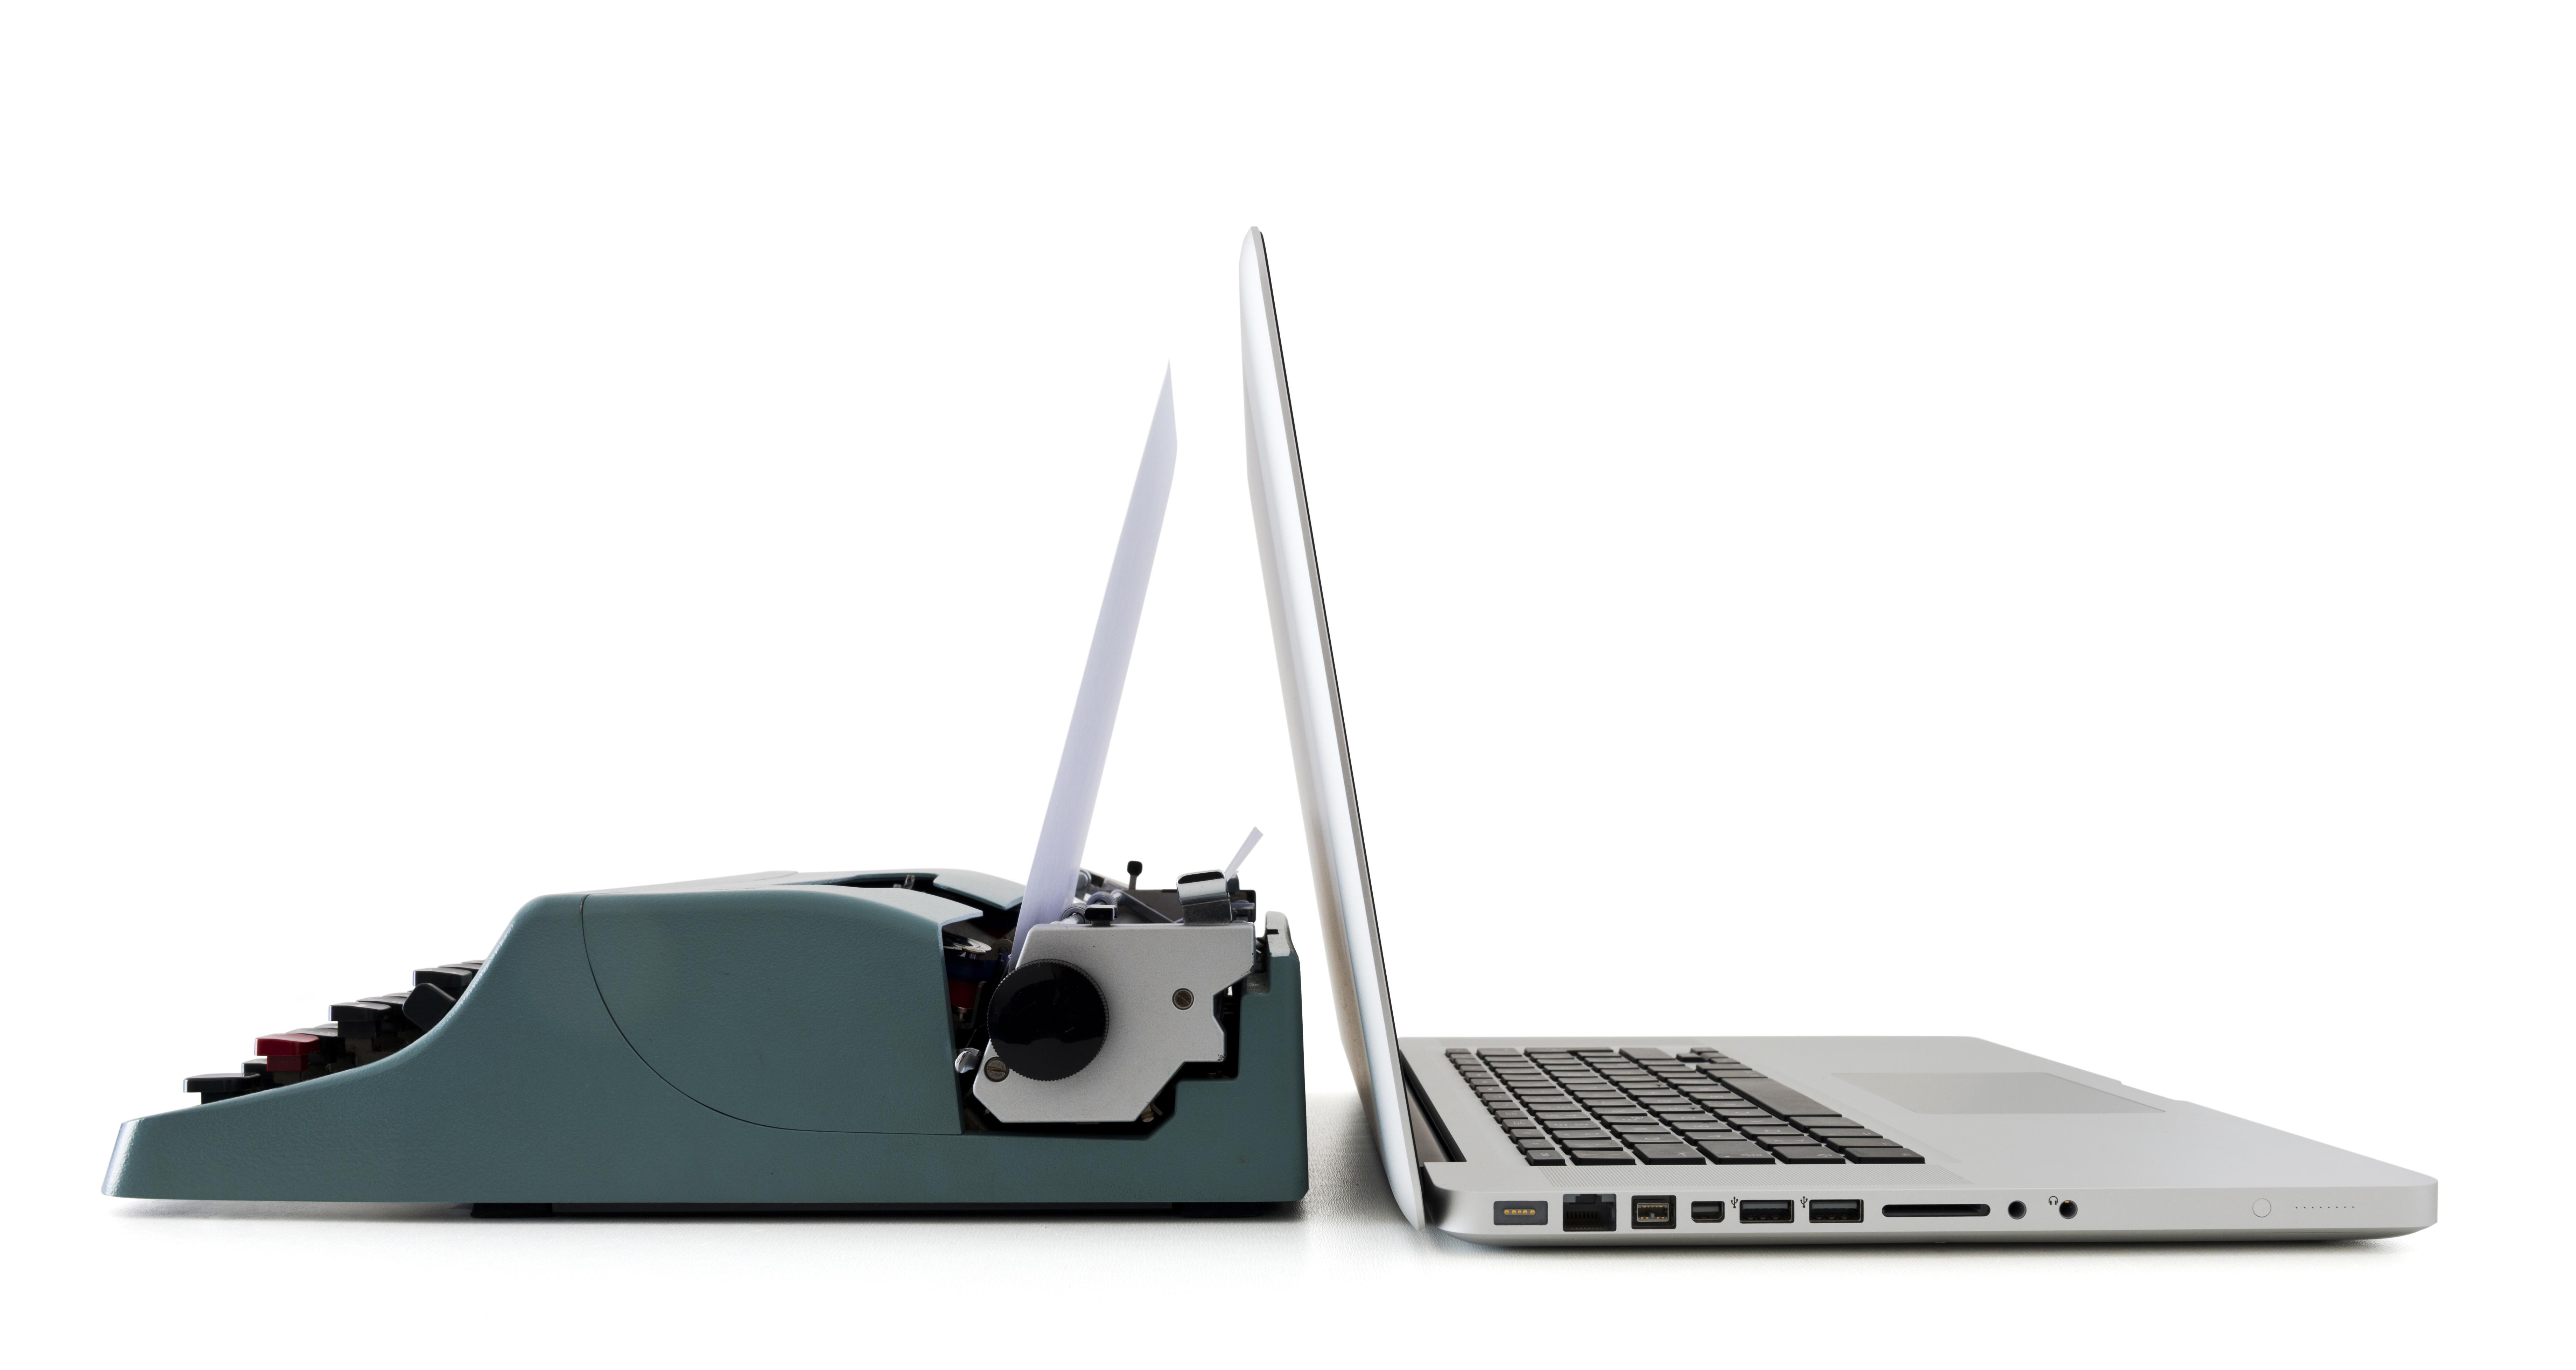 Computer_Laptop.jpeg